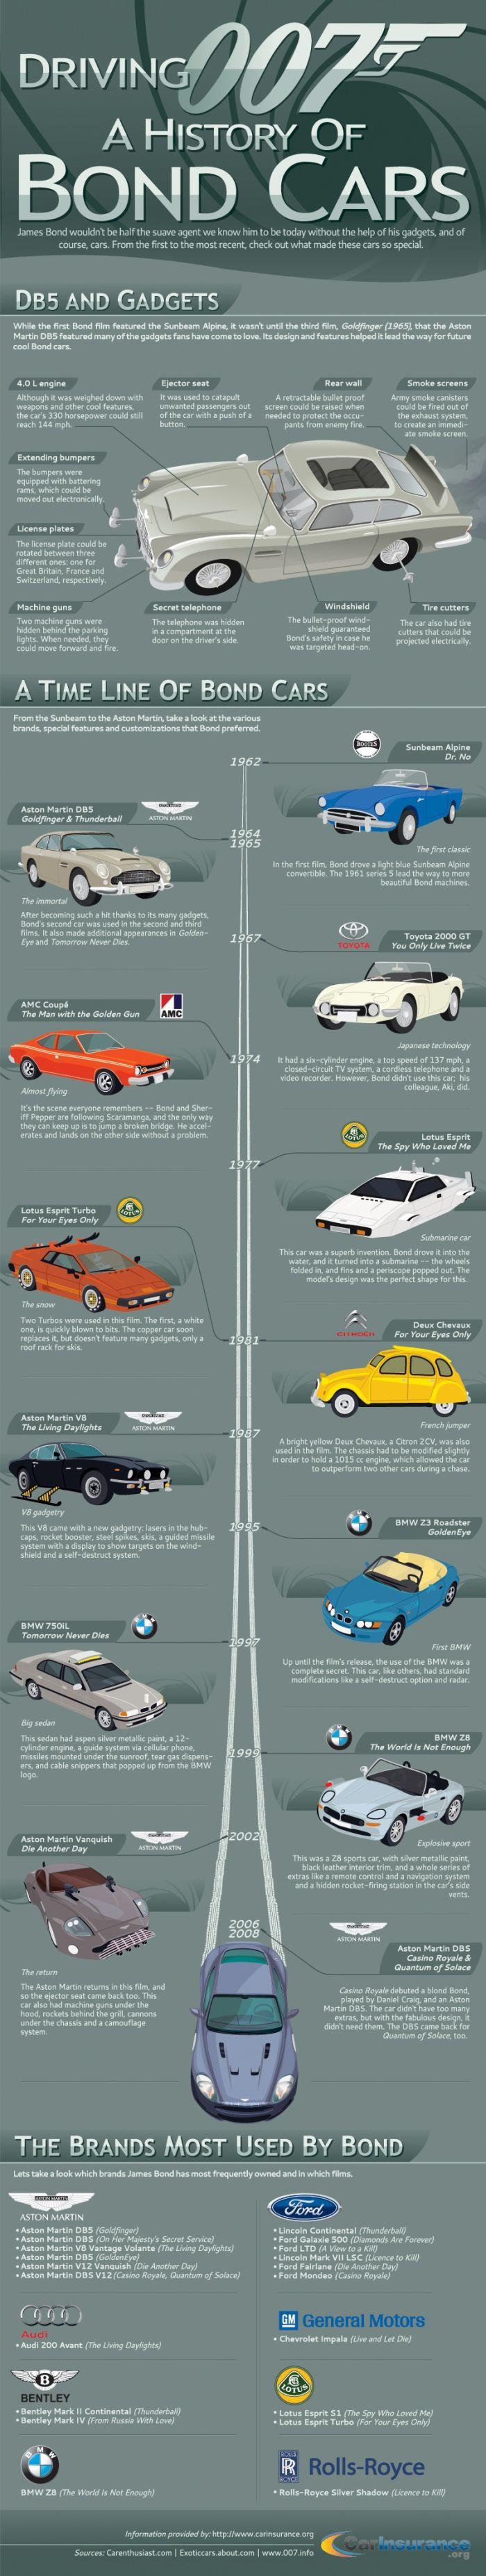 James Bond Cars Time Line